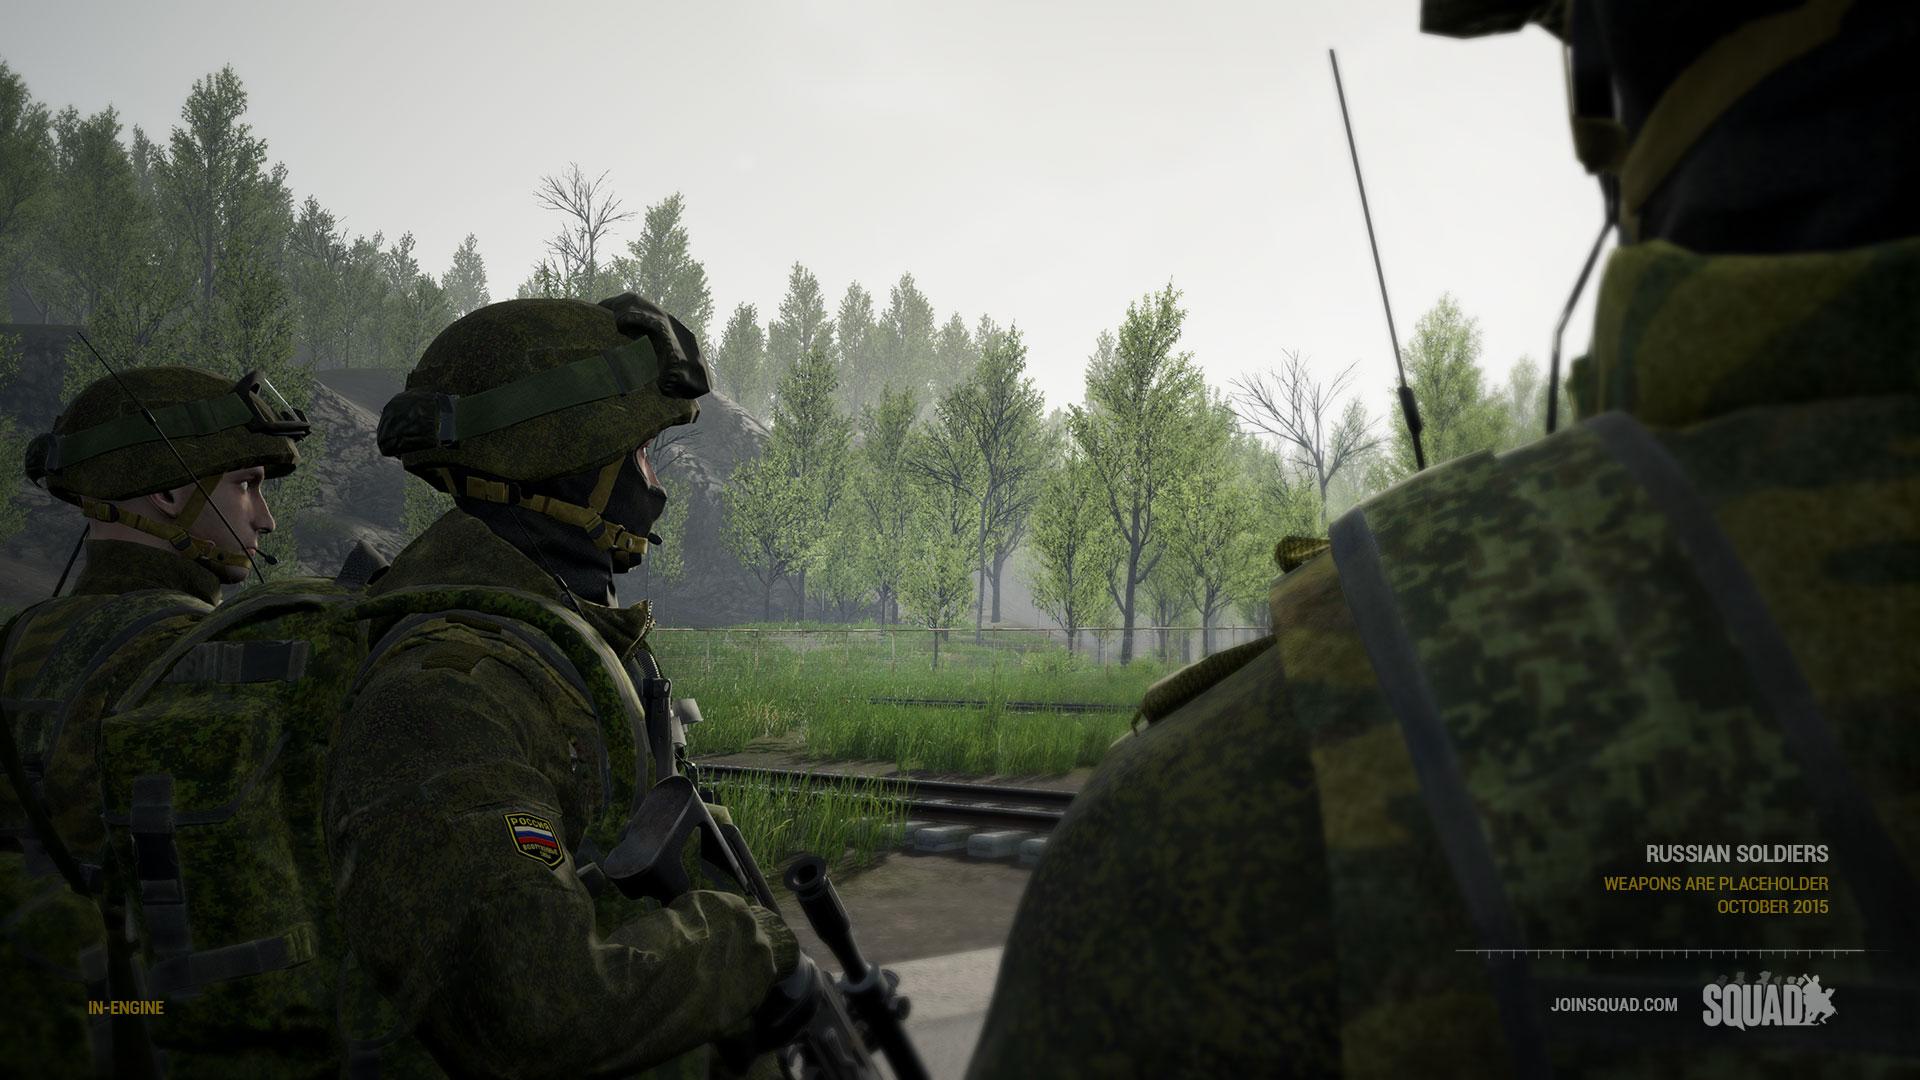 Скачать steam на пк на русском